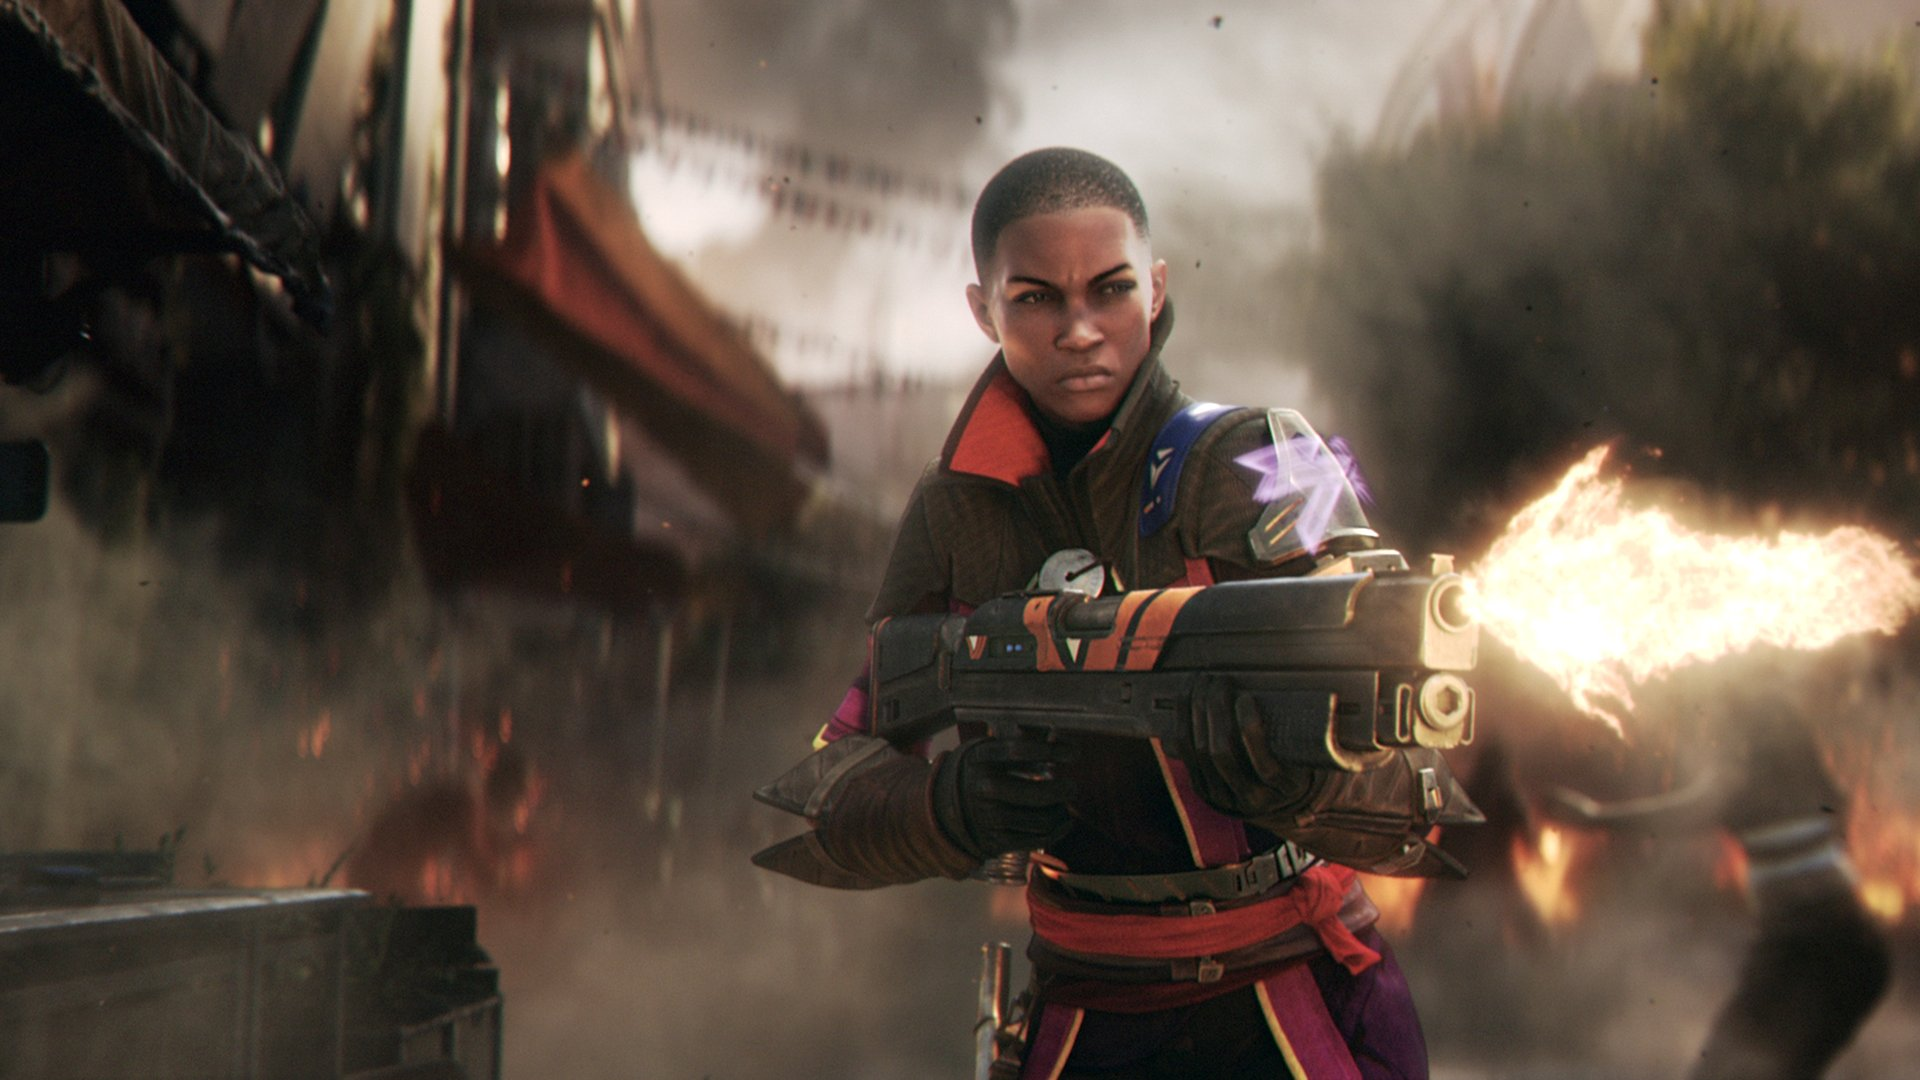 Destiny-2-Campaign-guide-Missions-Lost-Sectors-Treasure-Maps-and-more